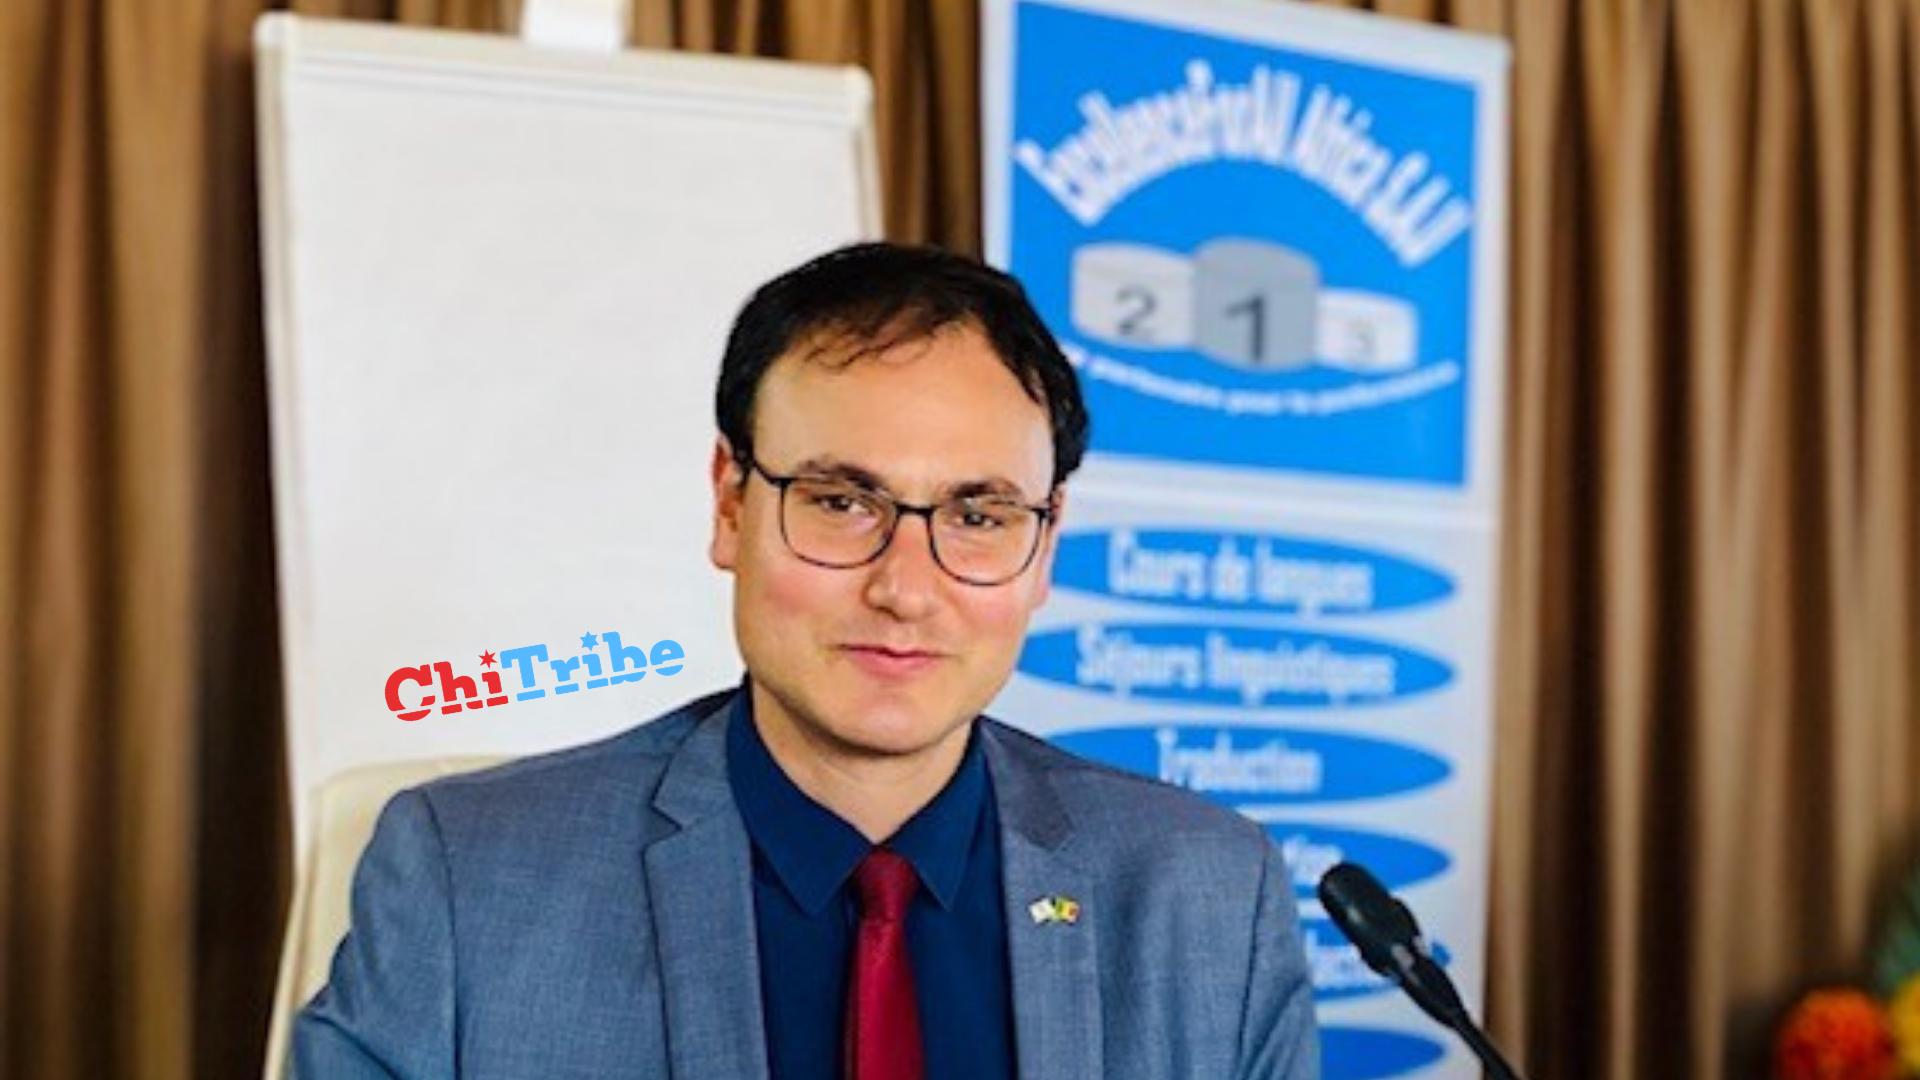 Daniel Aschheim chitribe jewish person of the week